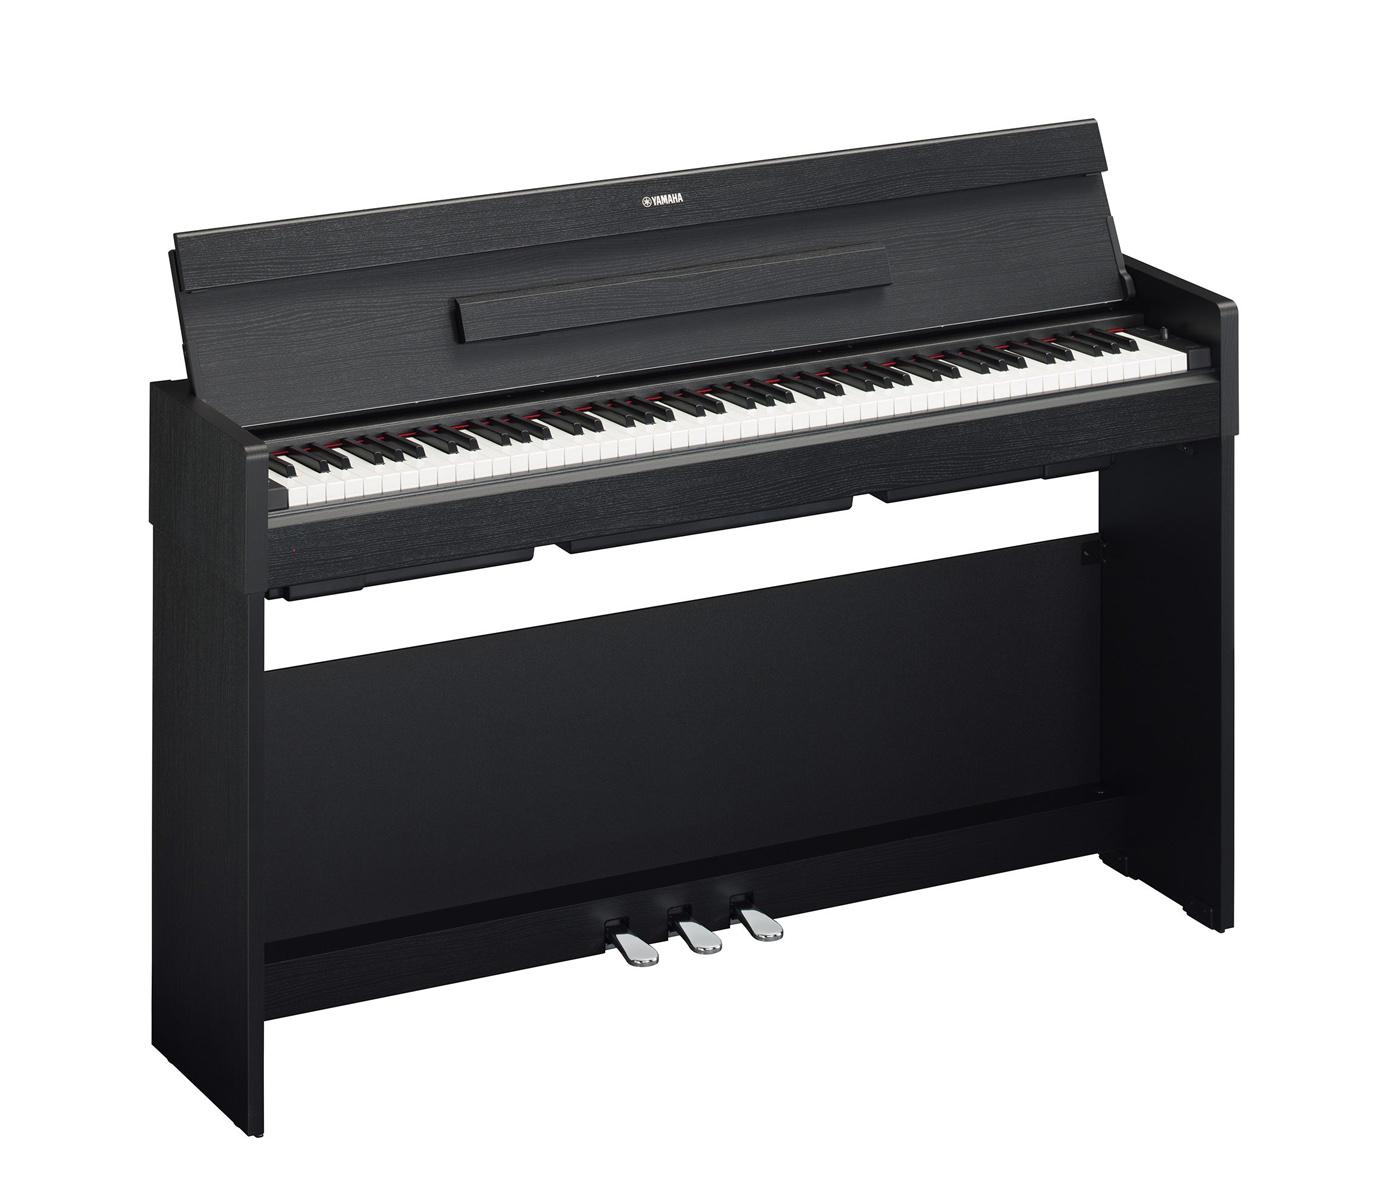 Piano Digital Yamaha Arius YDP-S34B